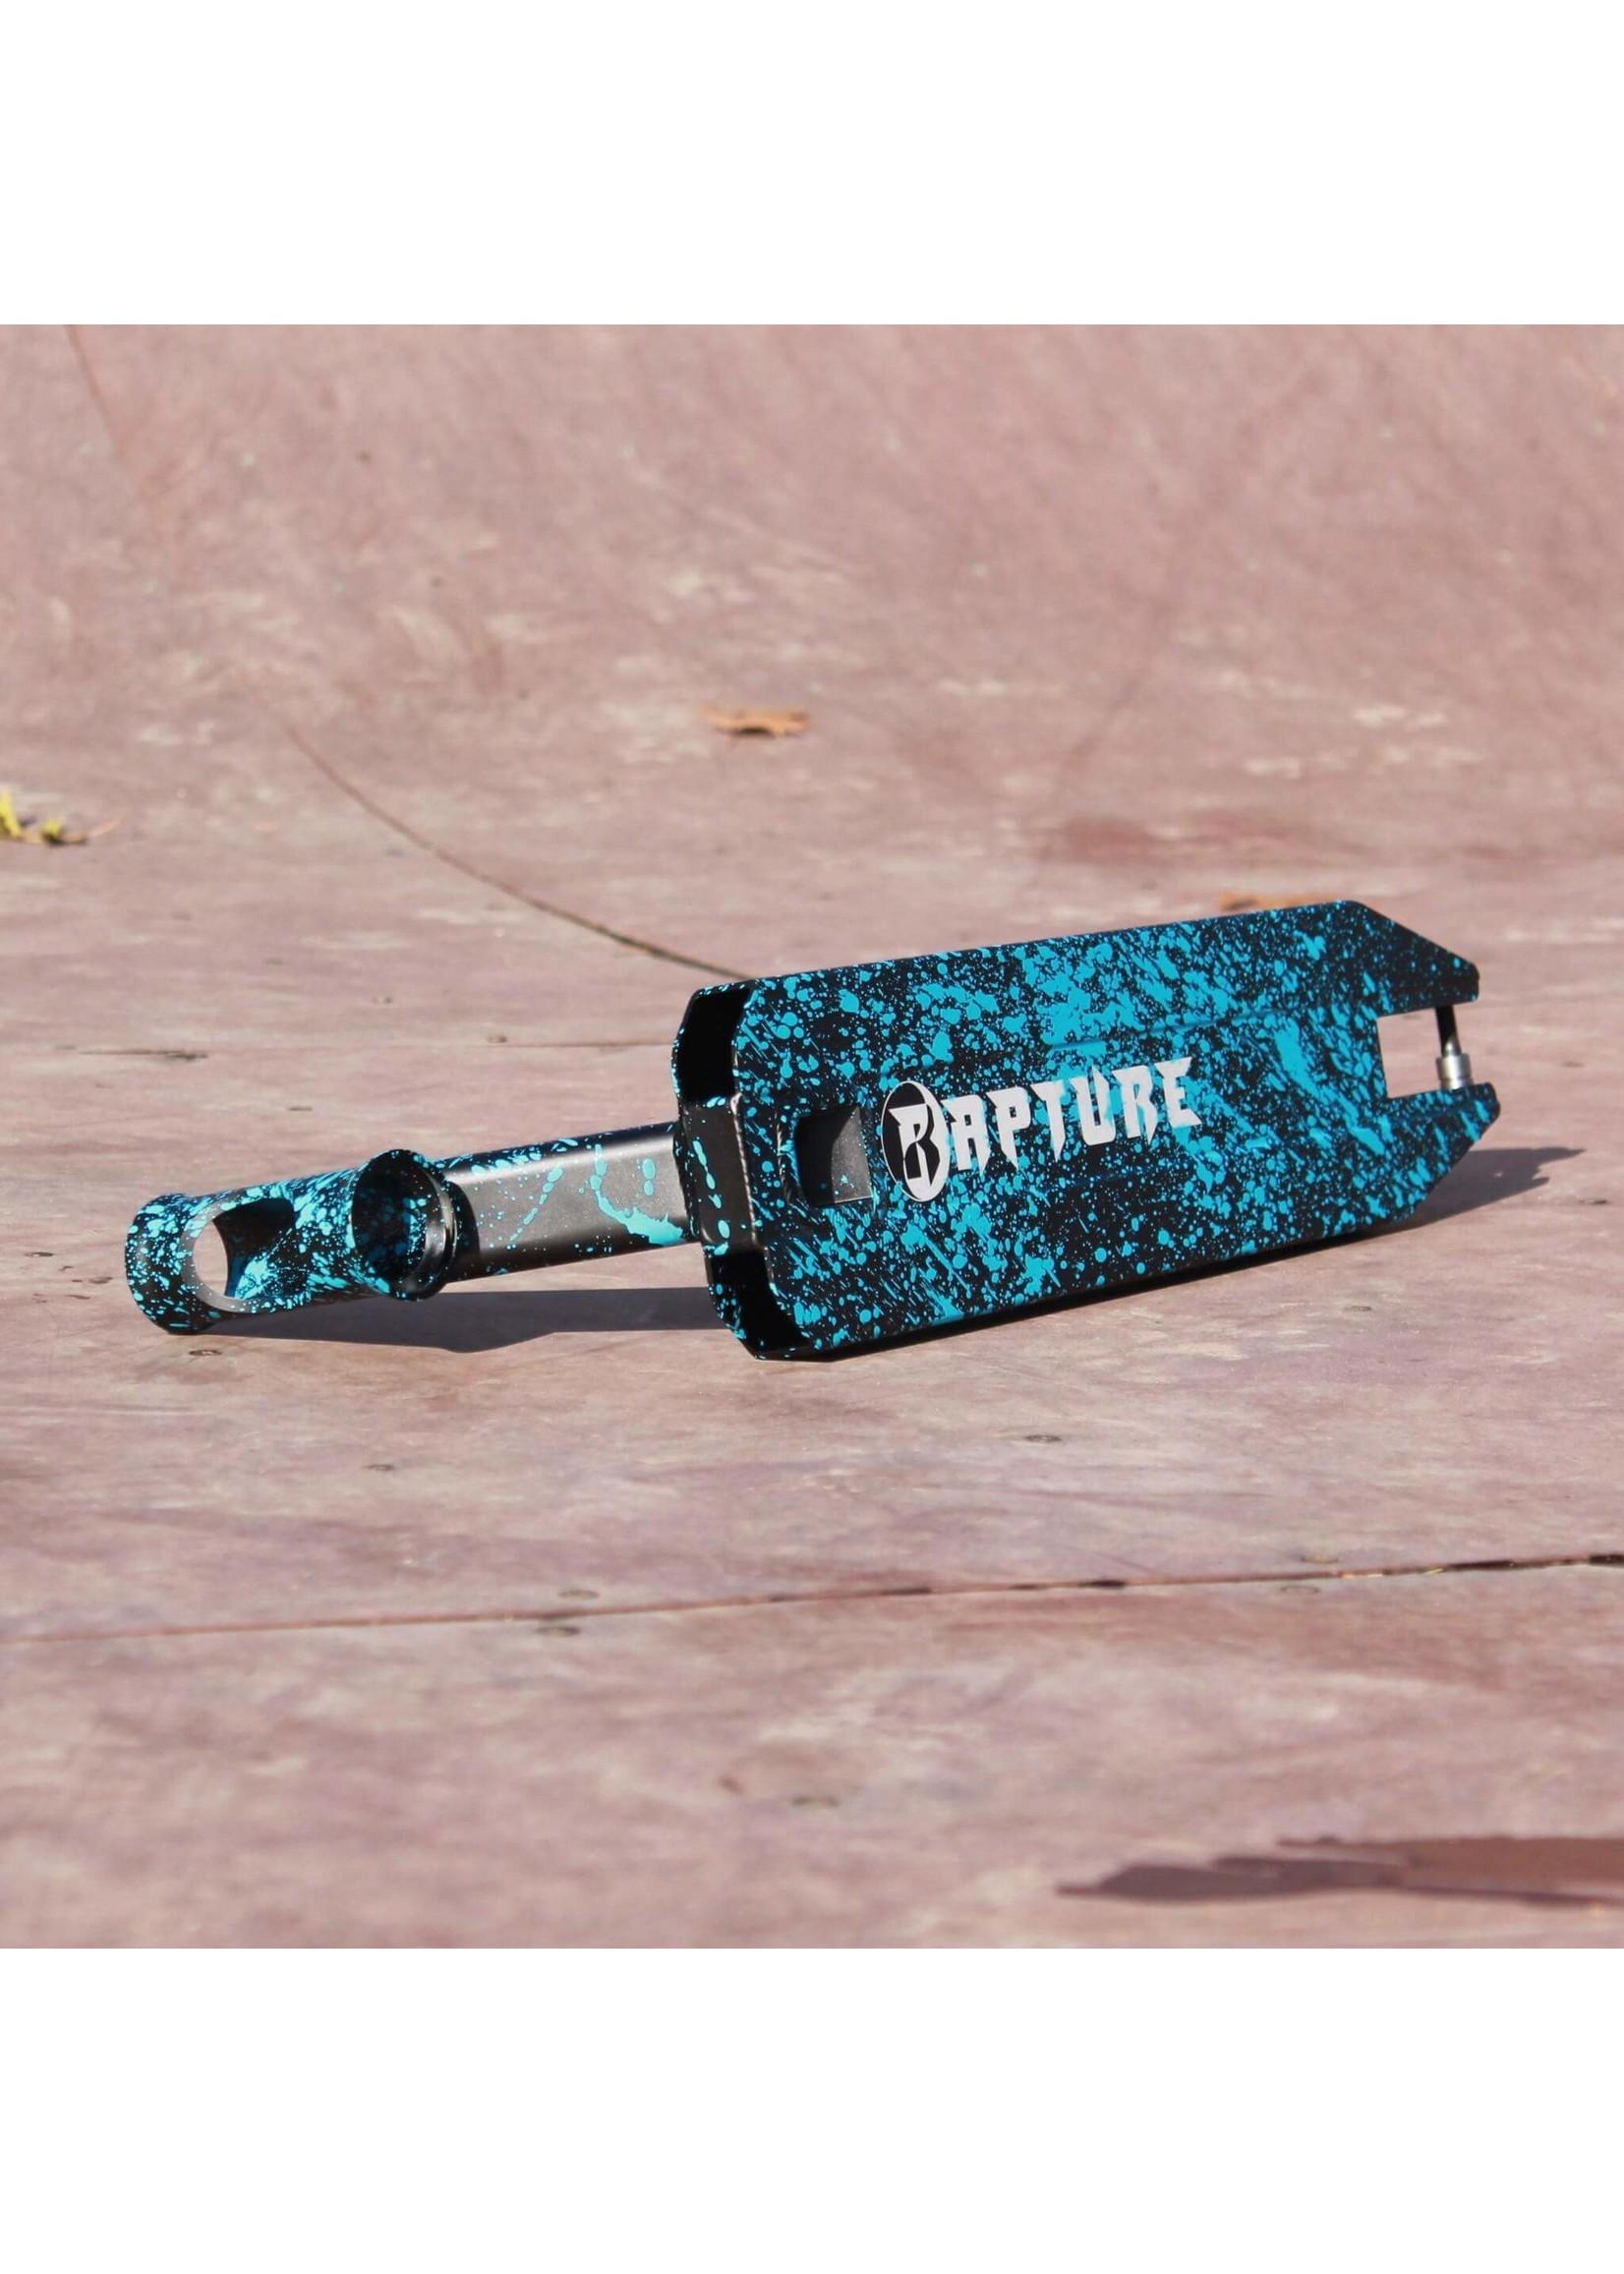 Rapture Rapture - Spyder Deck - 20.5